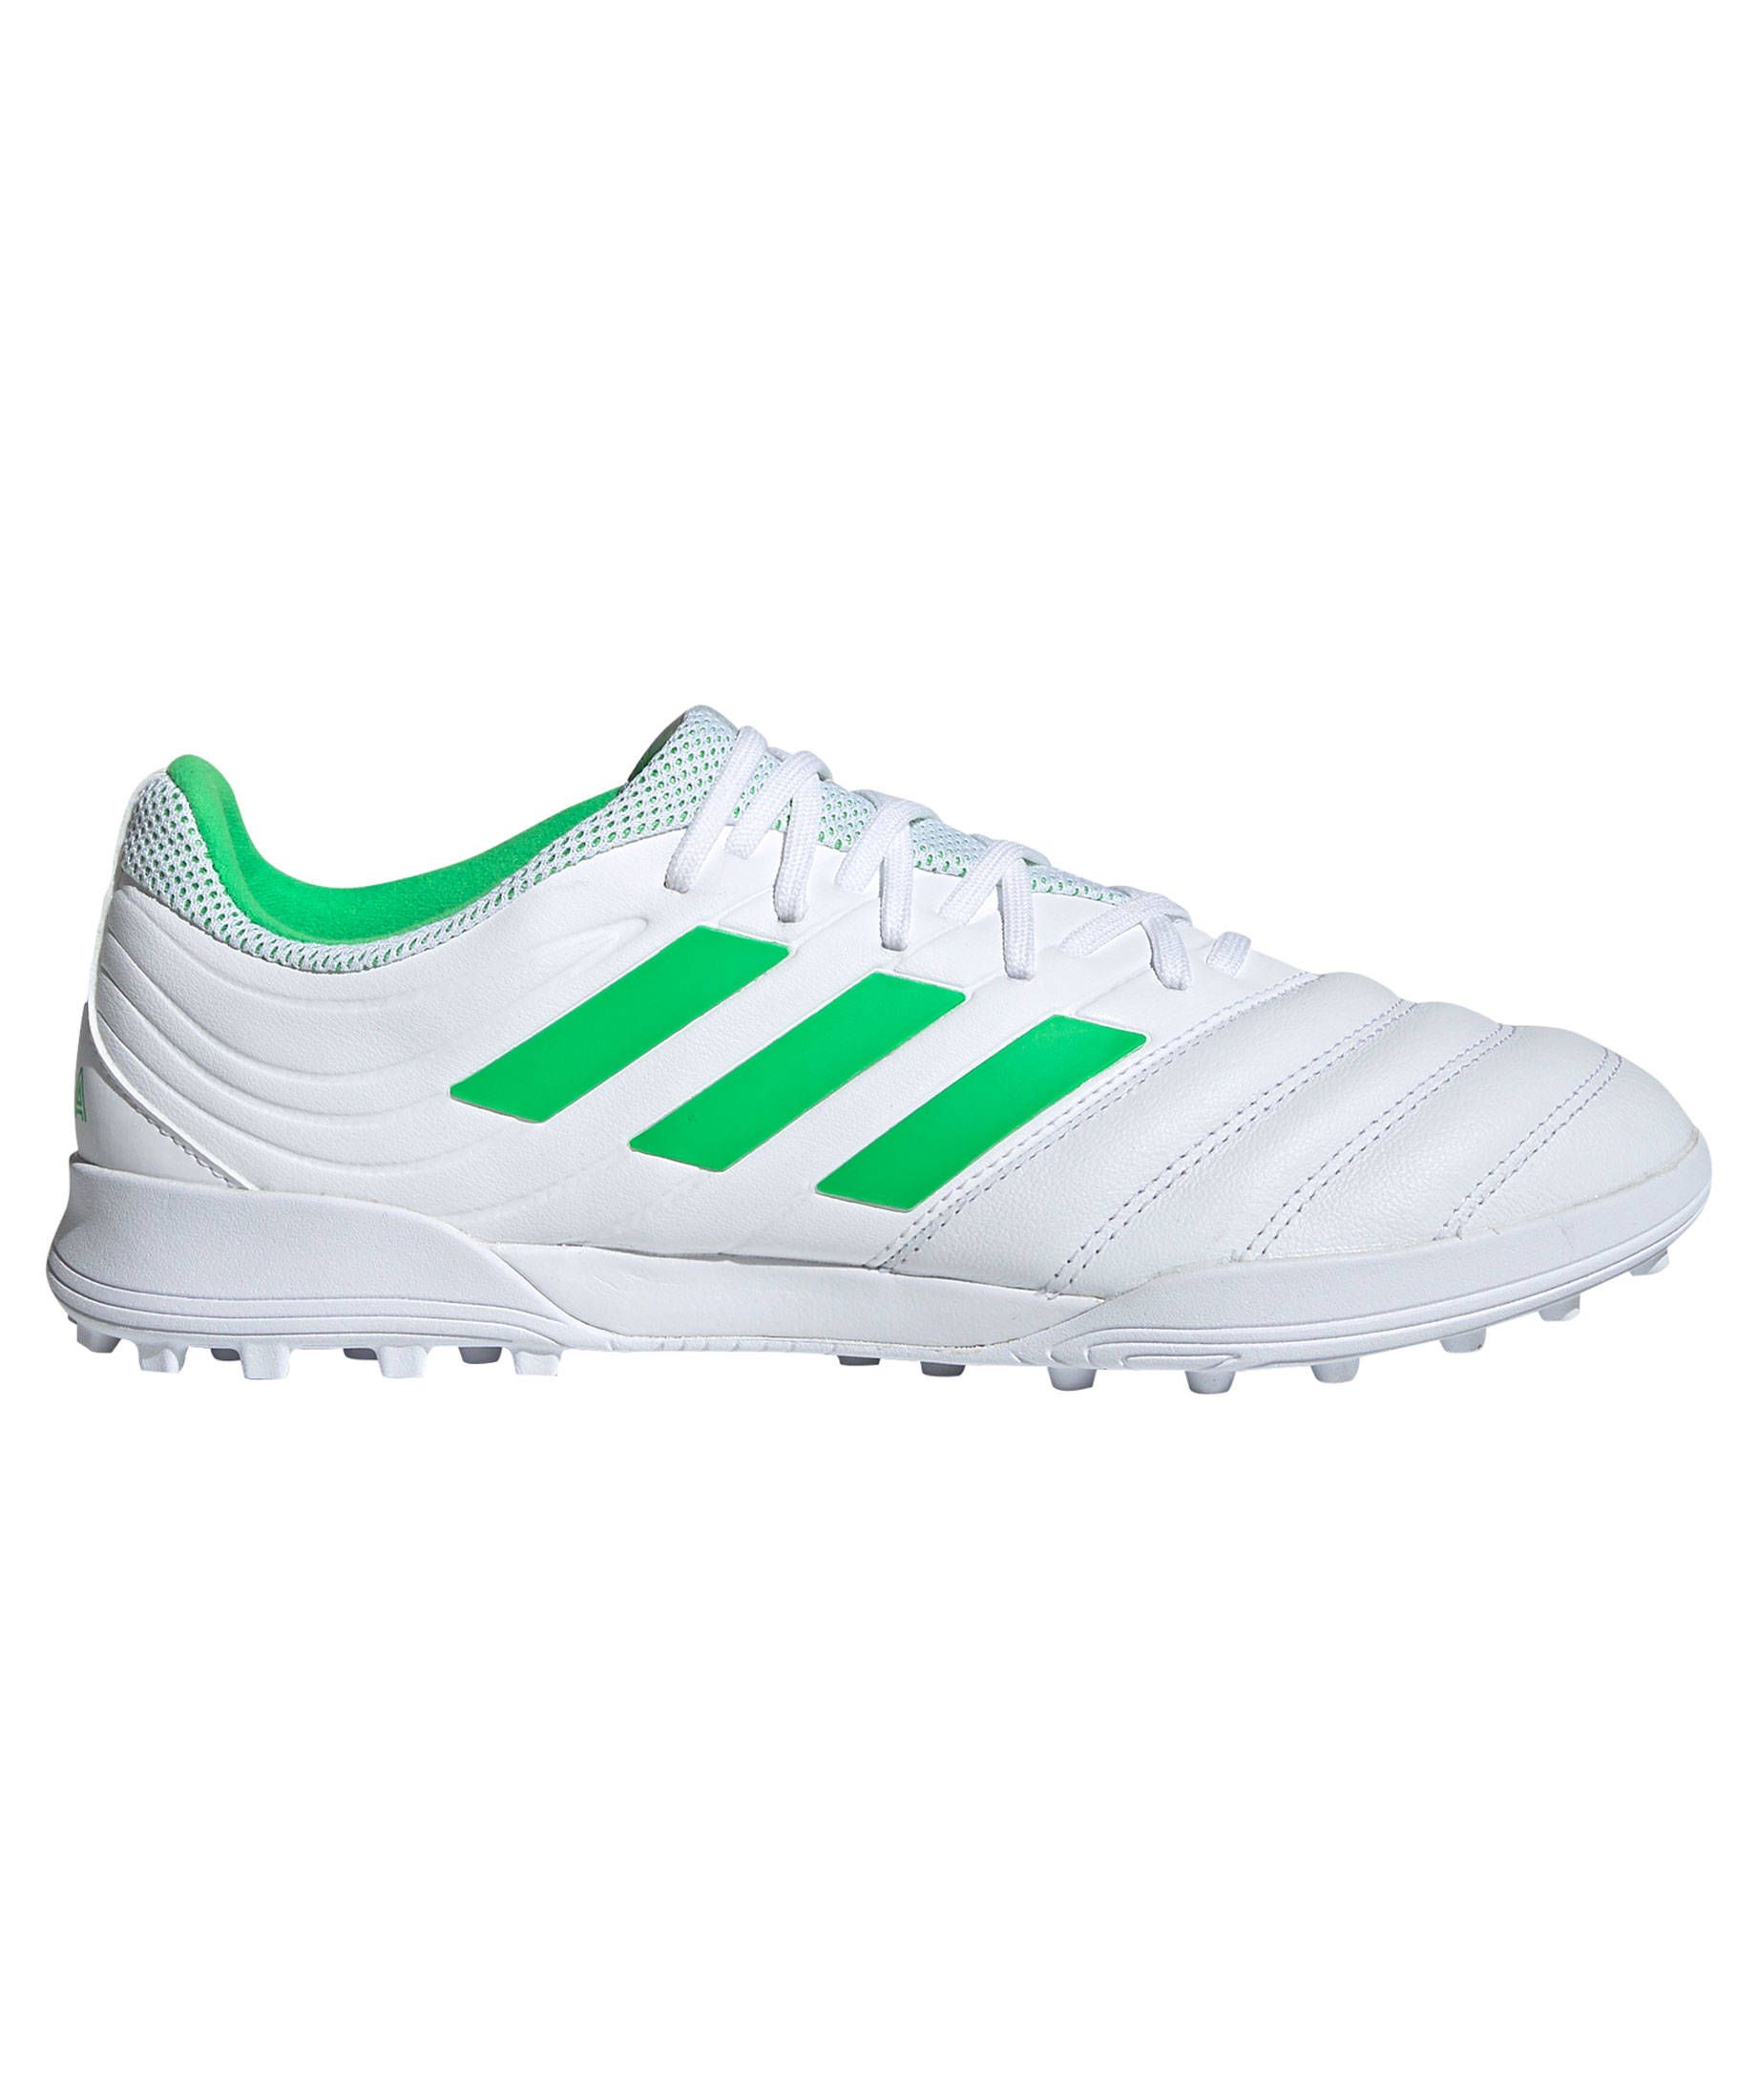 Adidas Performance Herren Fussballschuhe Halle Copa 19 3